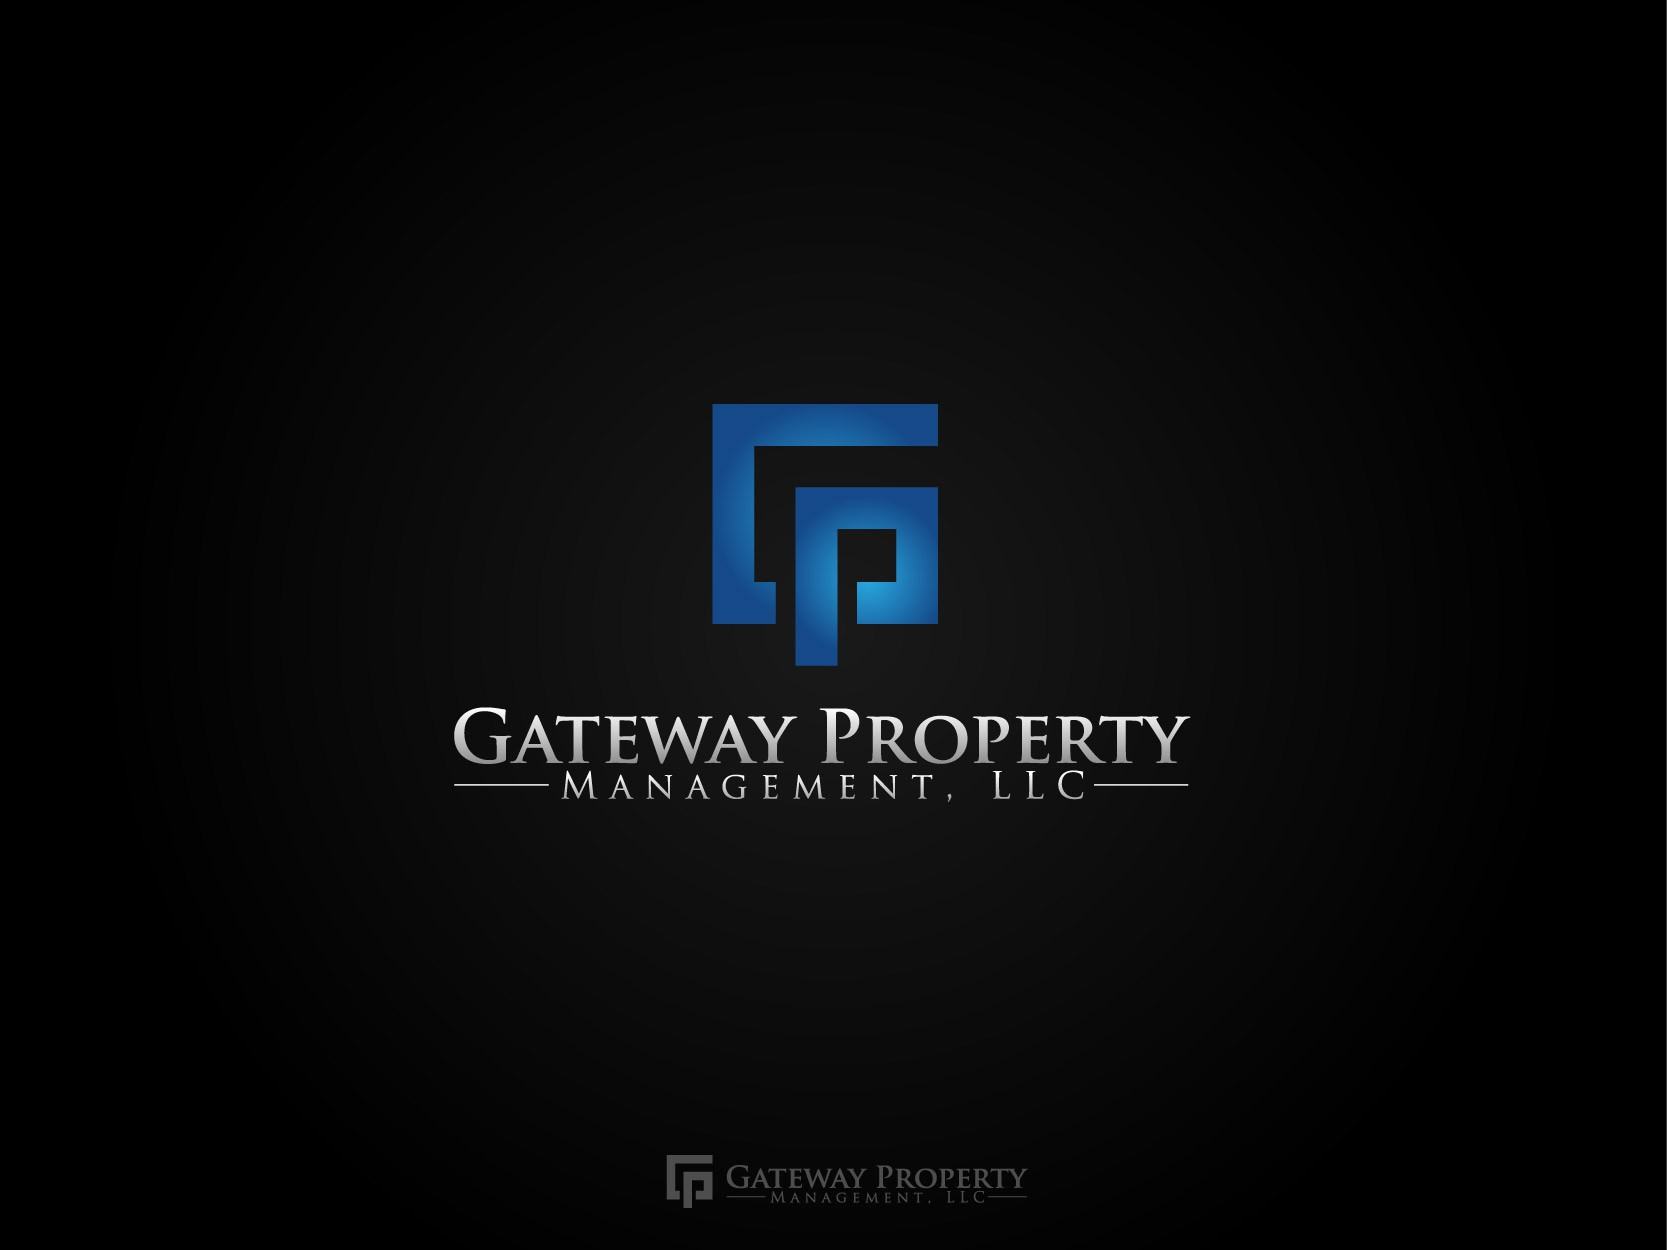 Help Gateway Property Management, LLC with a new logo